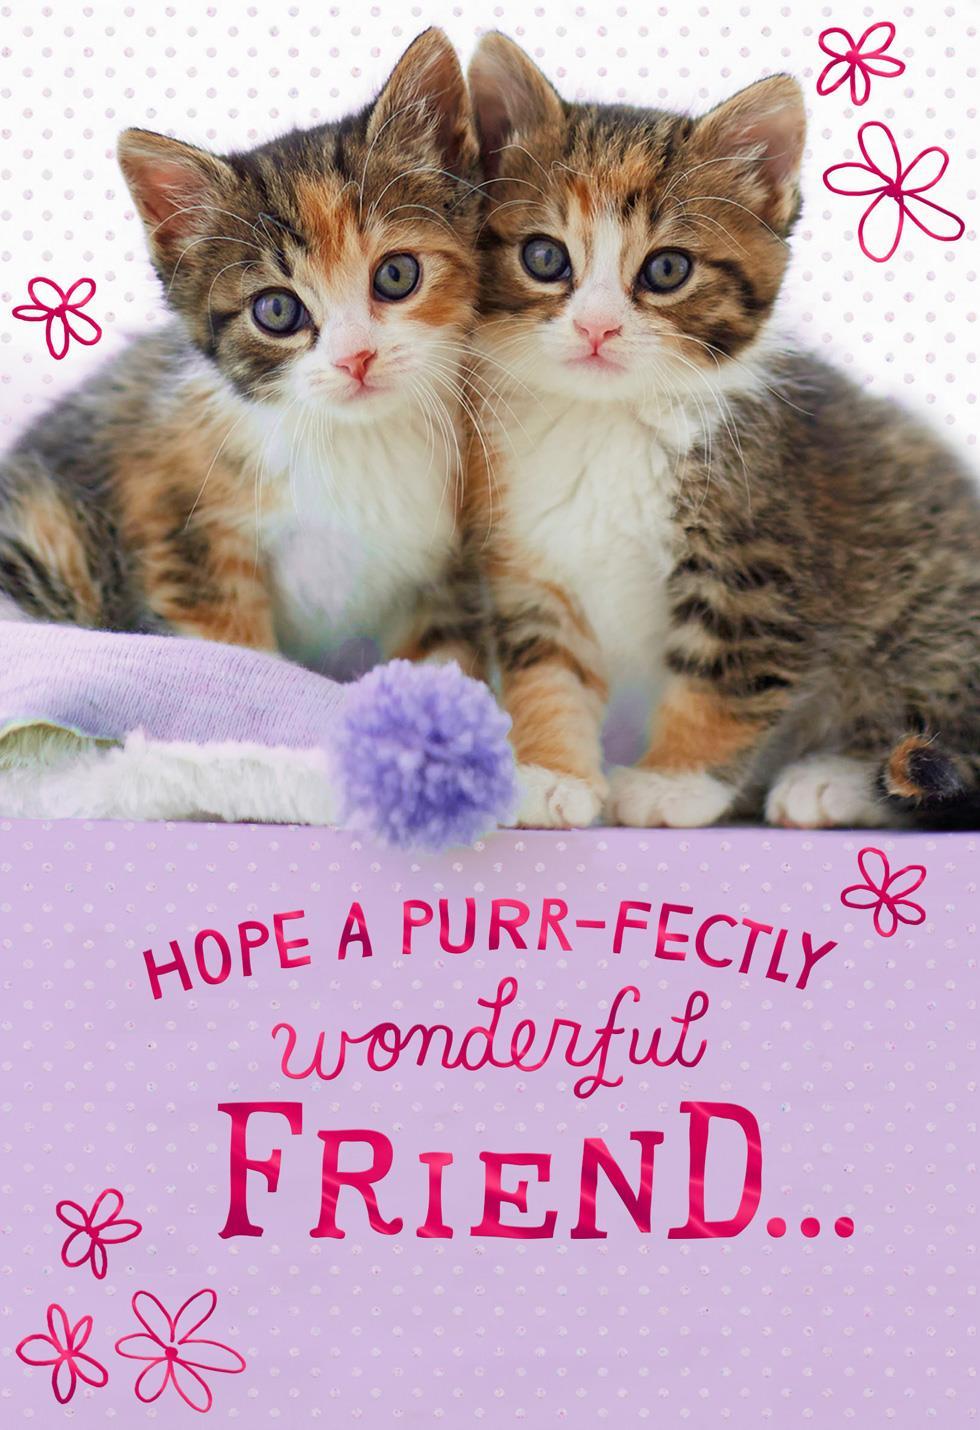 Purr Fectly Wonderful Kittens Birthday Card For Friend